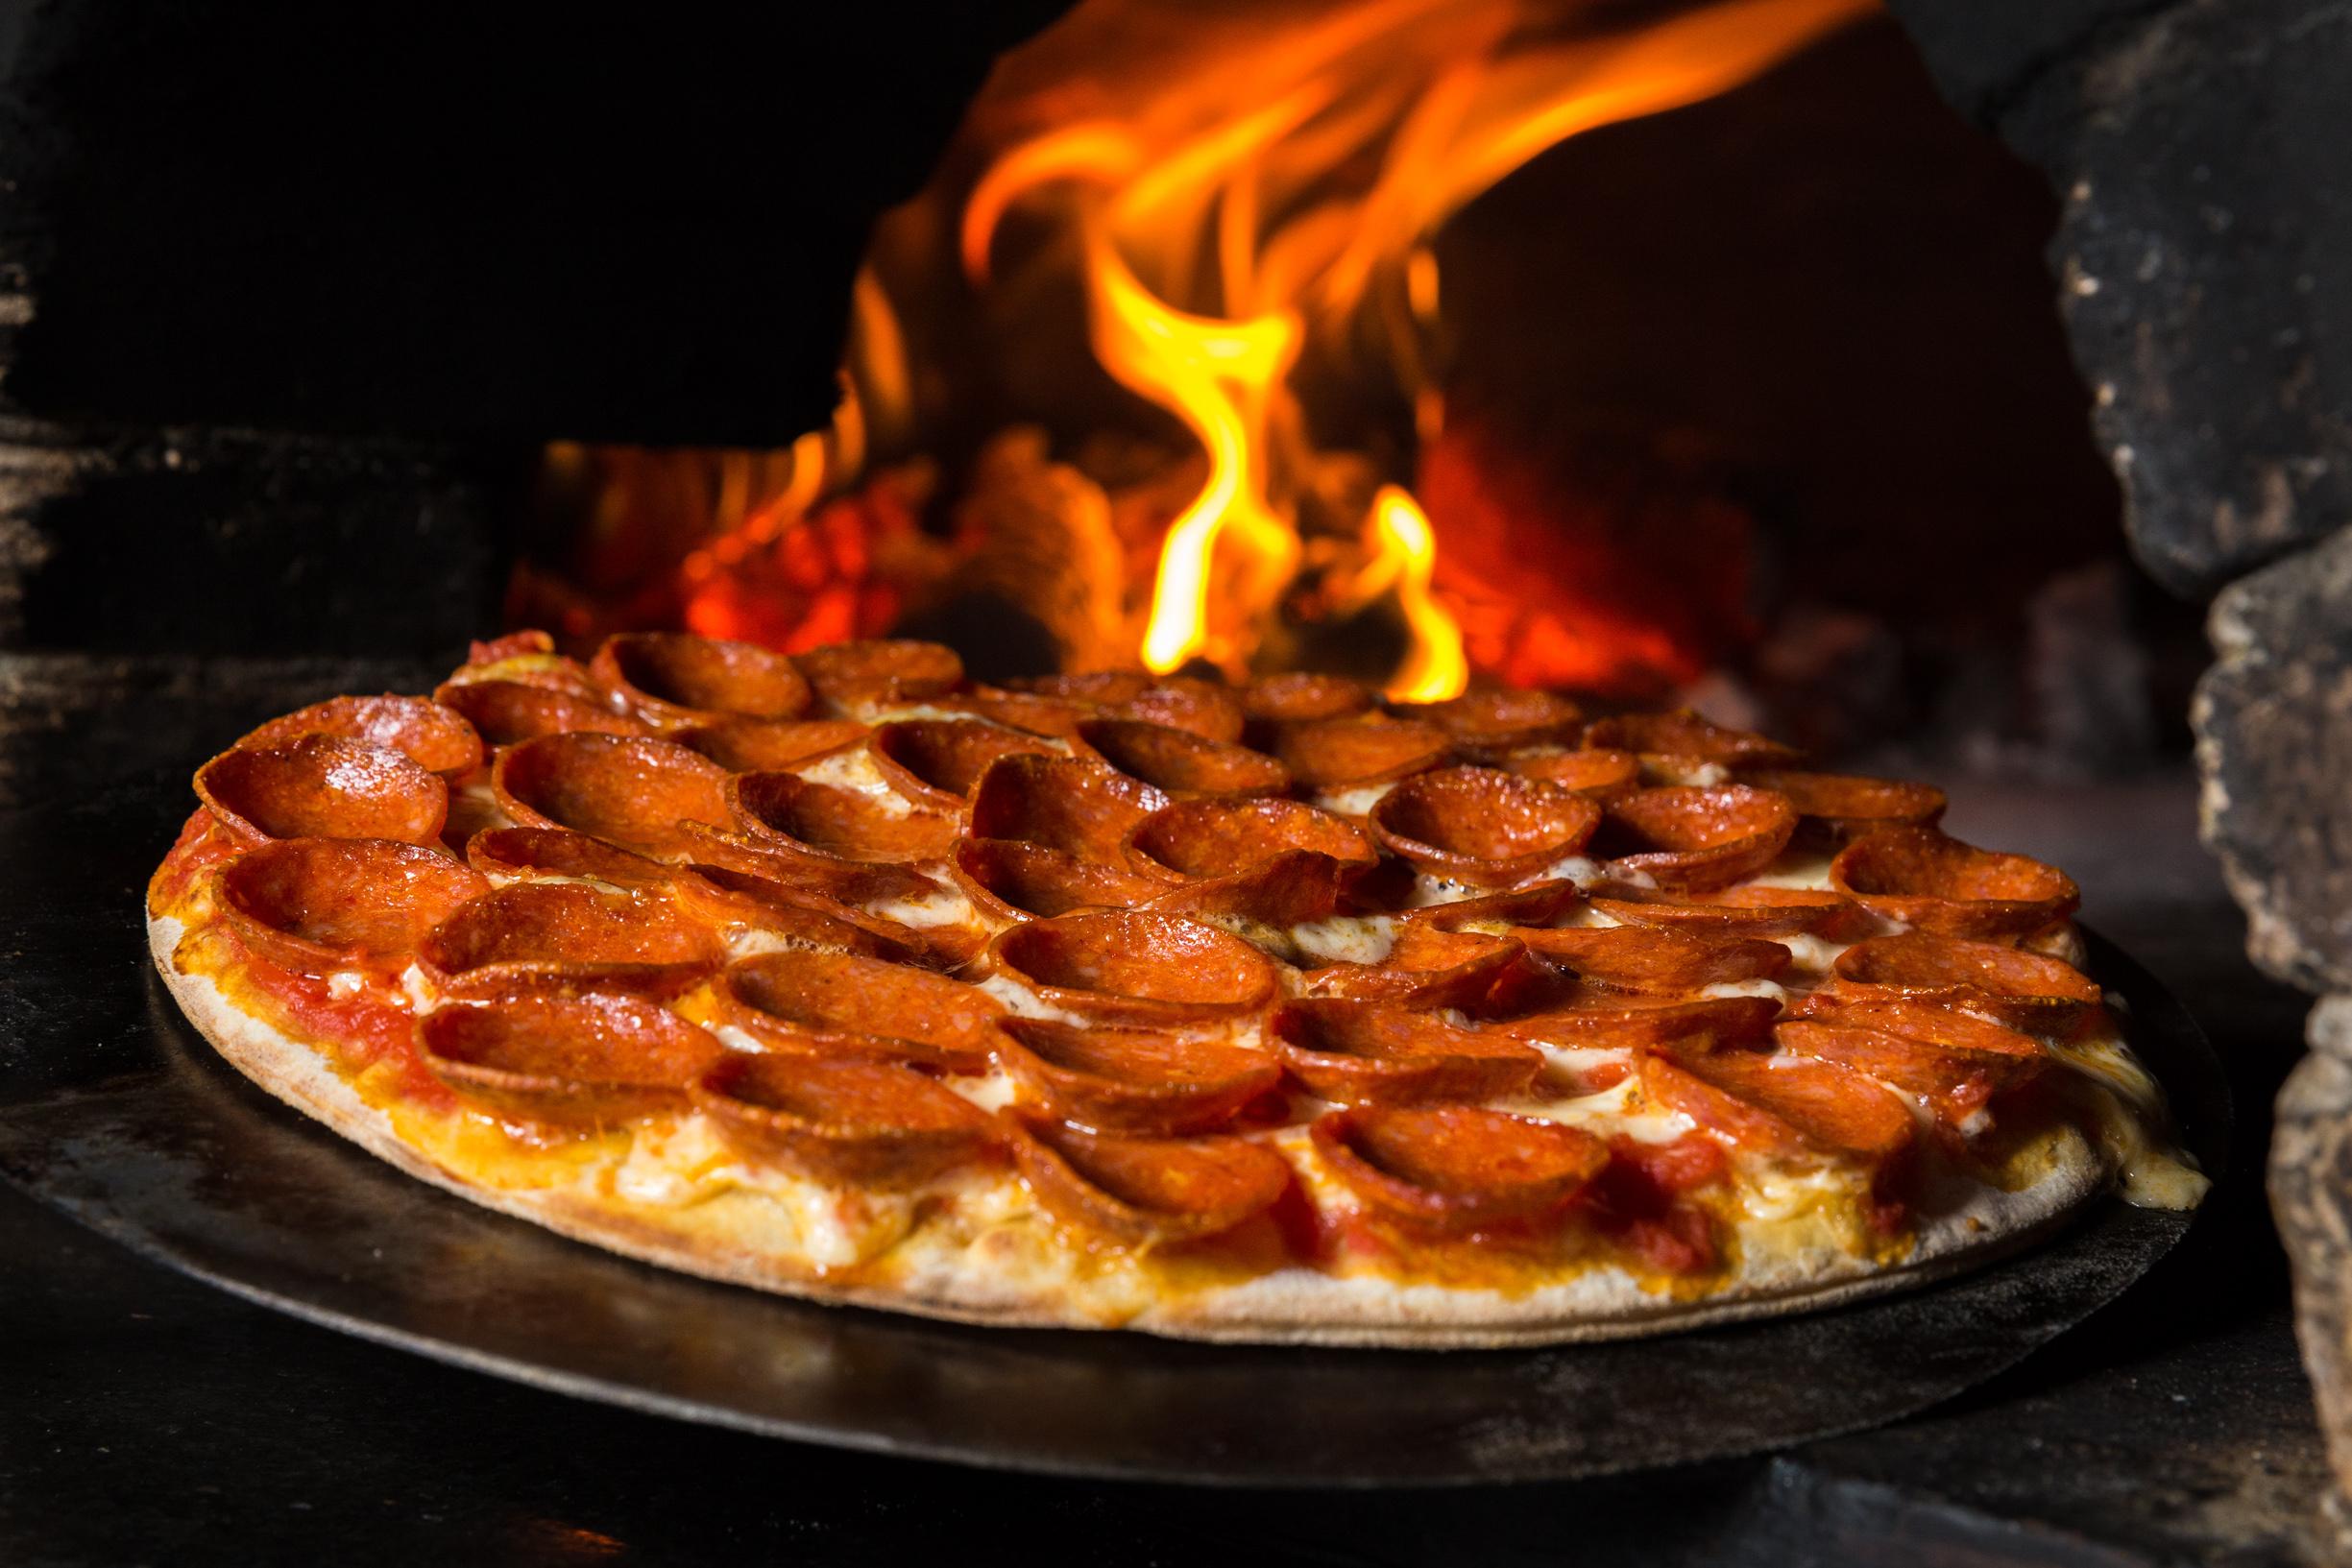 Pizza de pepperoni_Dolce Far Niente_Foto de Rener Oliveira (1).jpg